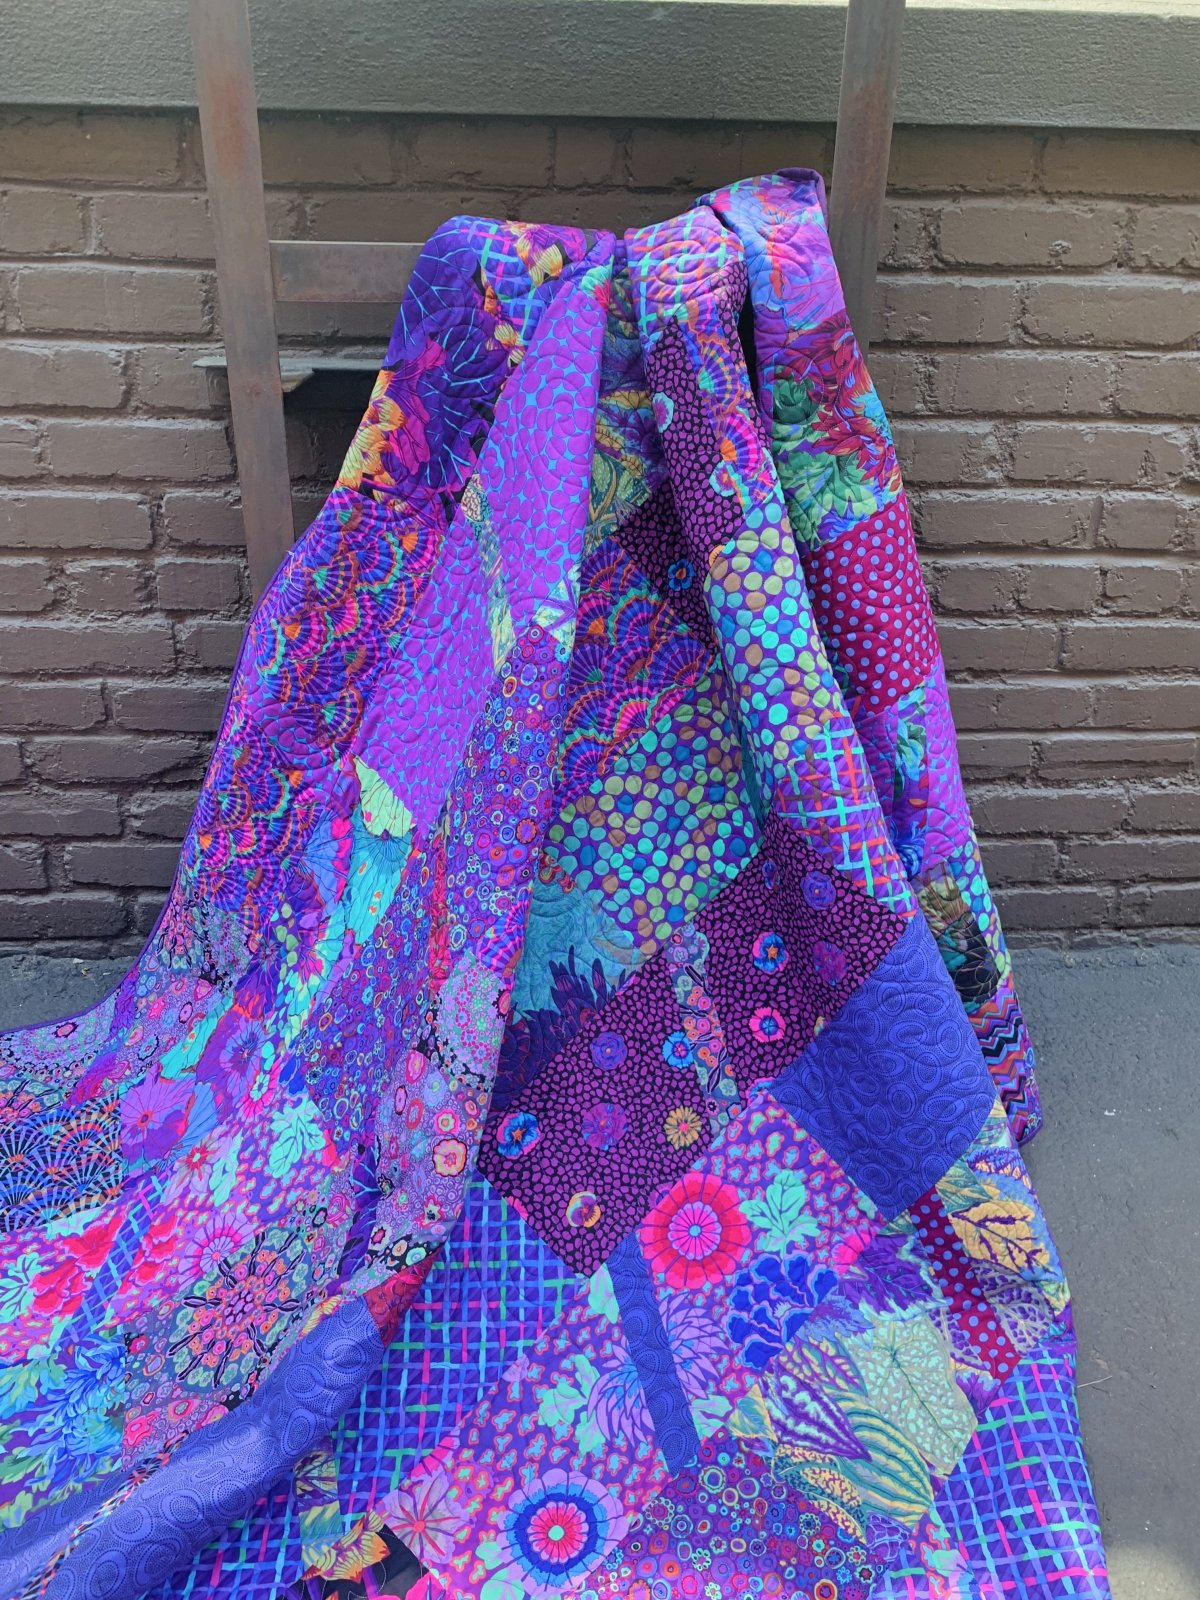 Available Now! RESTOCKED!!! Purple Haze Quilt Kit